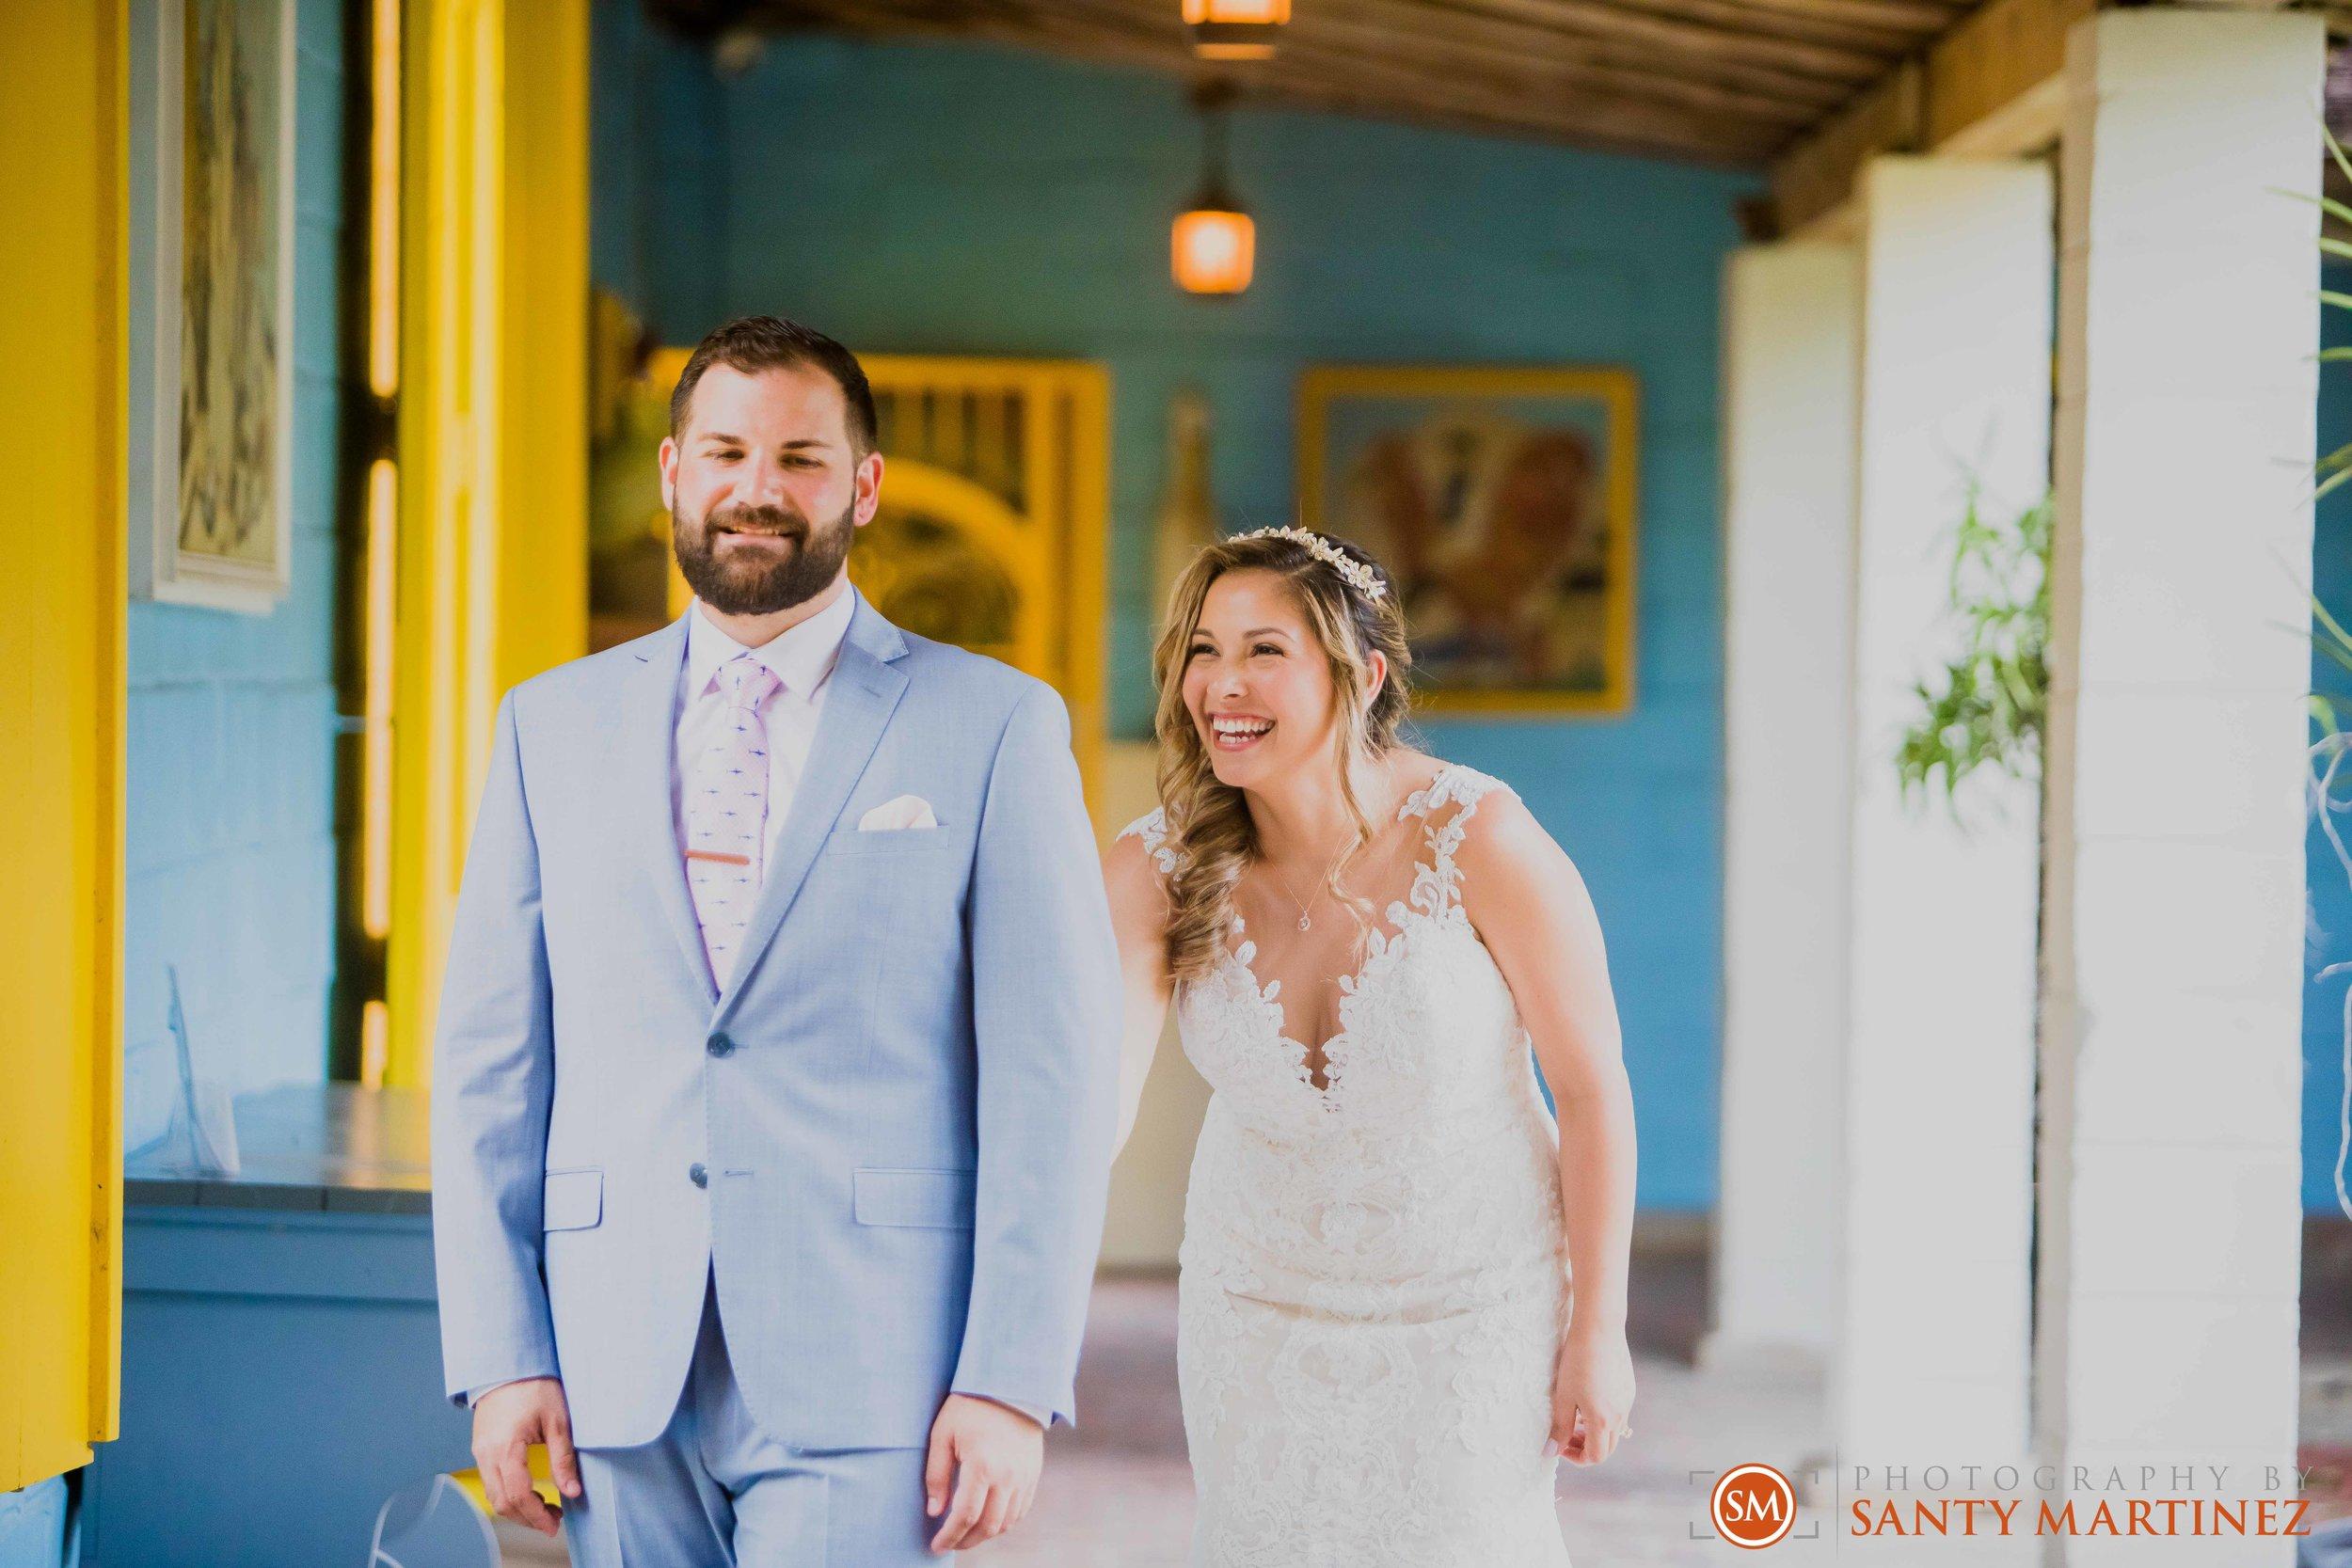 Wedding Bonnet House - Santy Martinez Photography-16.jpg